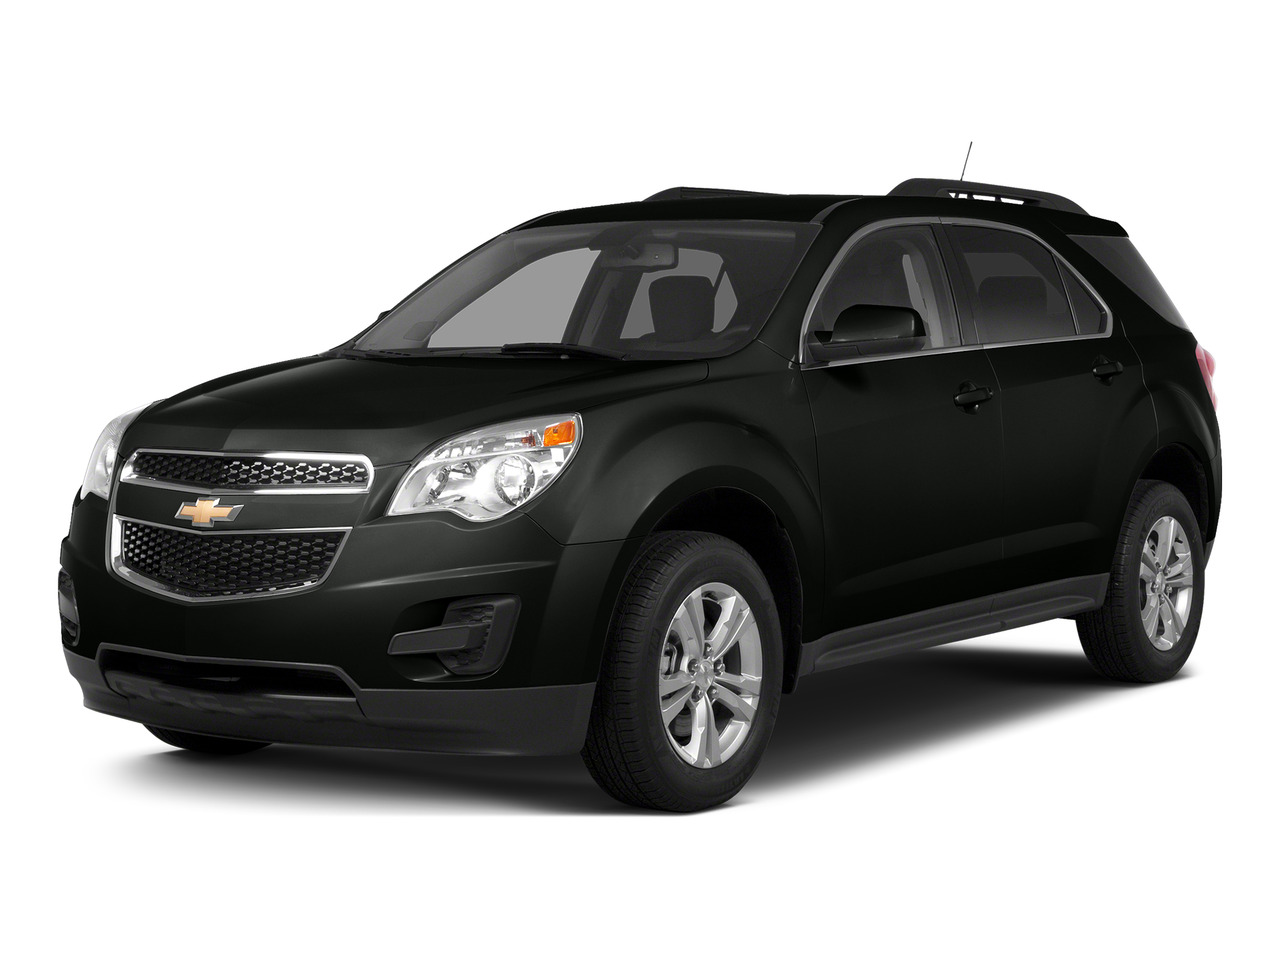 Black Granite Metallic 2015 Chevrolet Equinox LT SUV Wake Forest NC